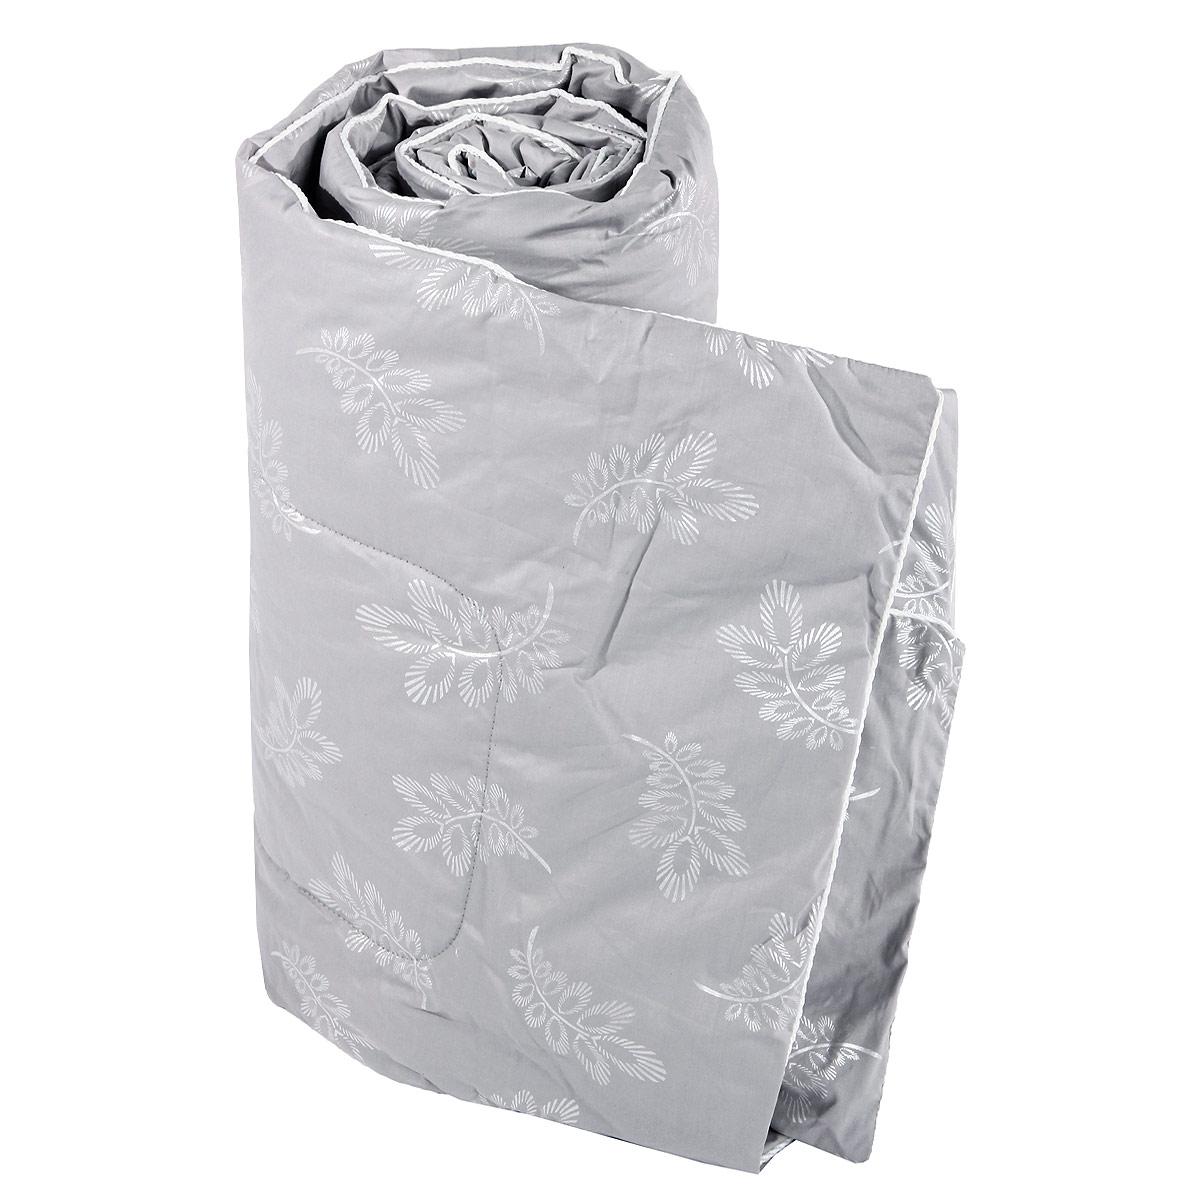 "Одеяло Dargez ""Прима"", наполнитель: пух, 140 х 205 см 22340П"